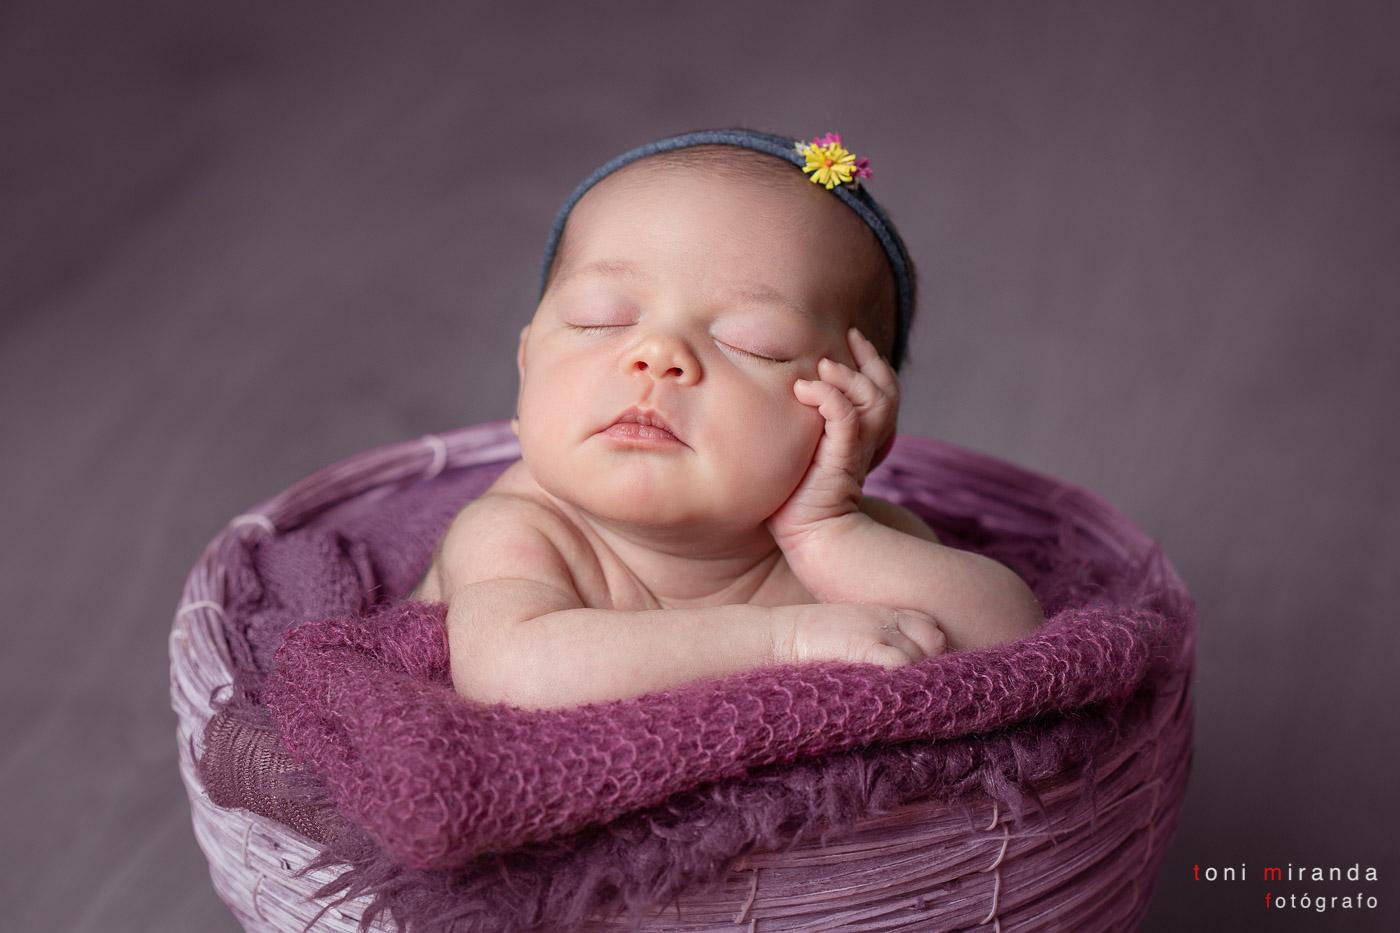 Newborn apoyada en cestita rosa